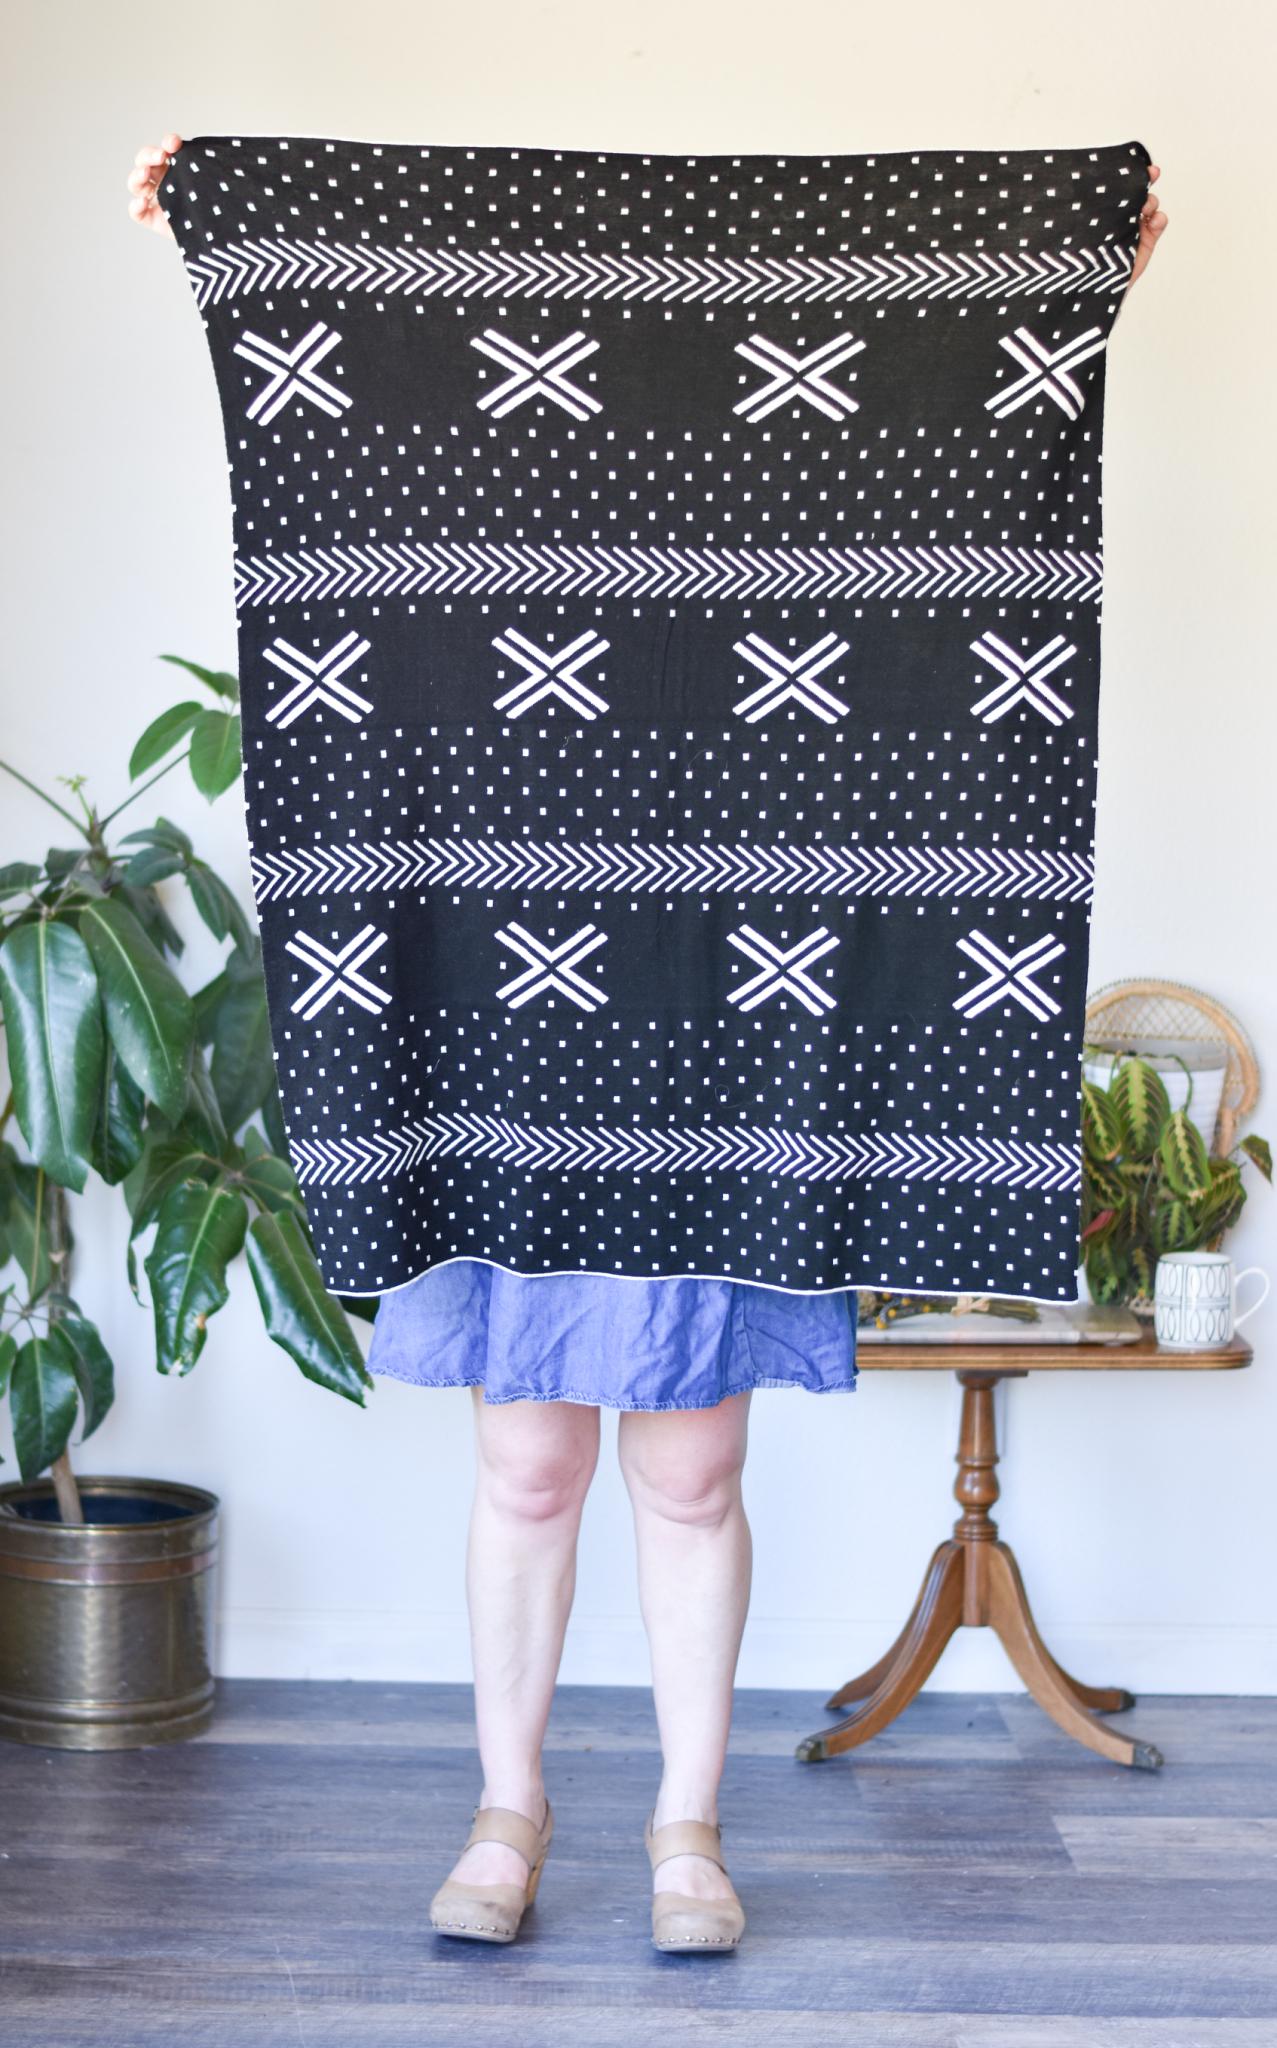 Cotton Knit Black and White Throw Blanket df0021